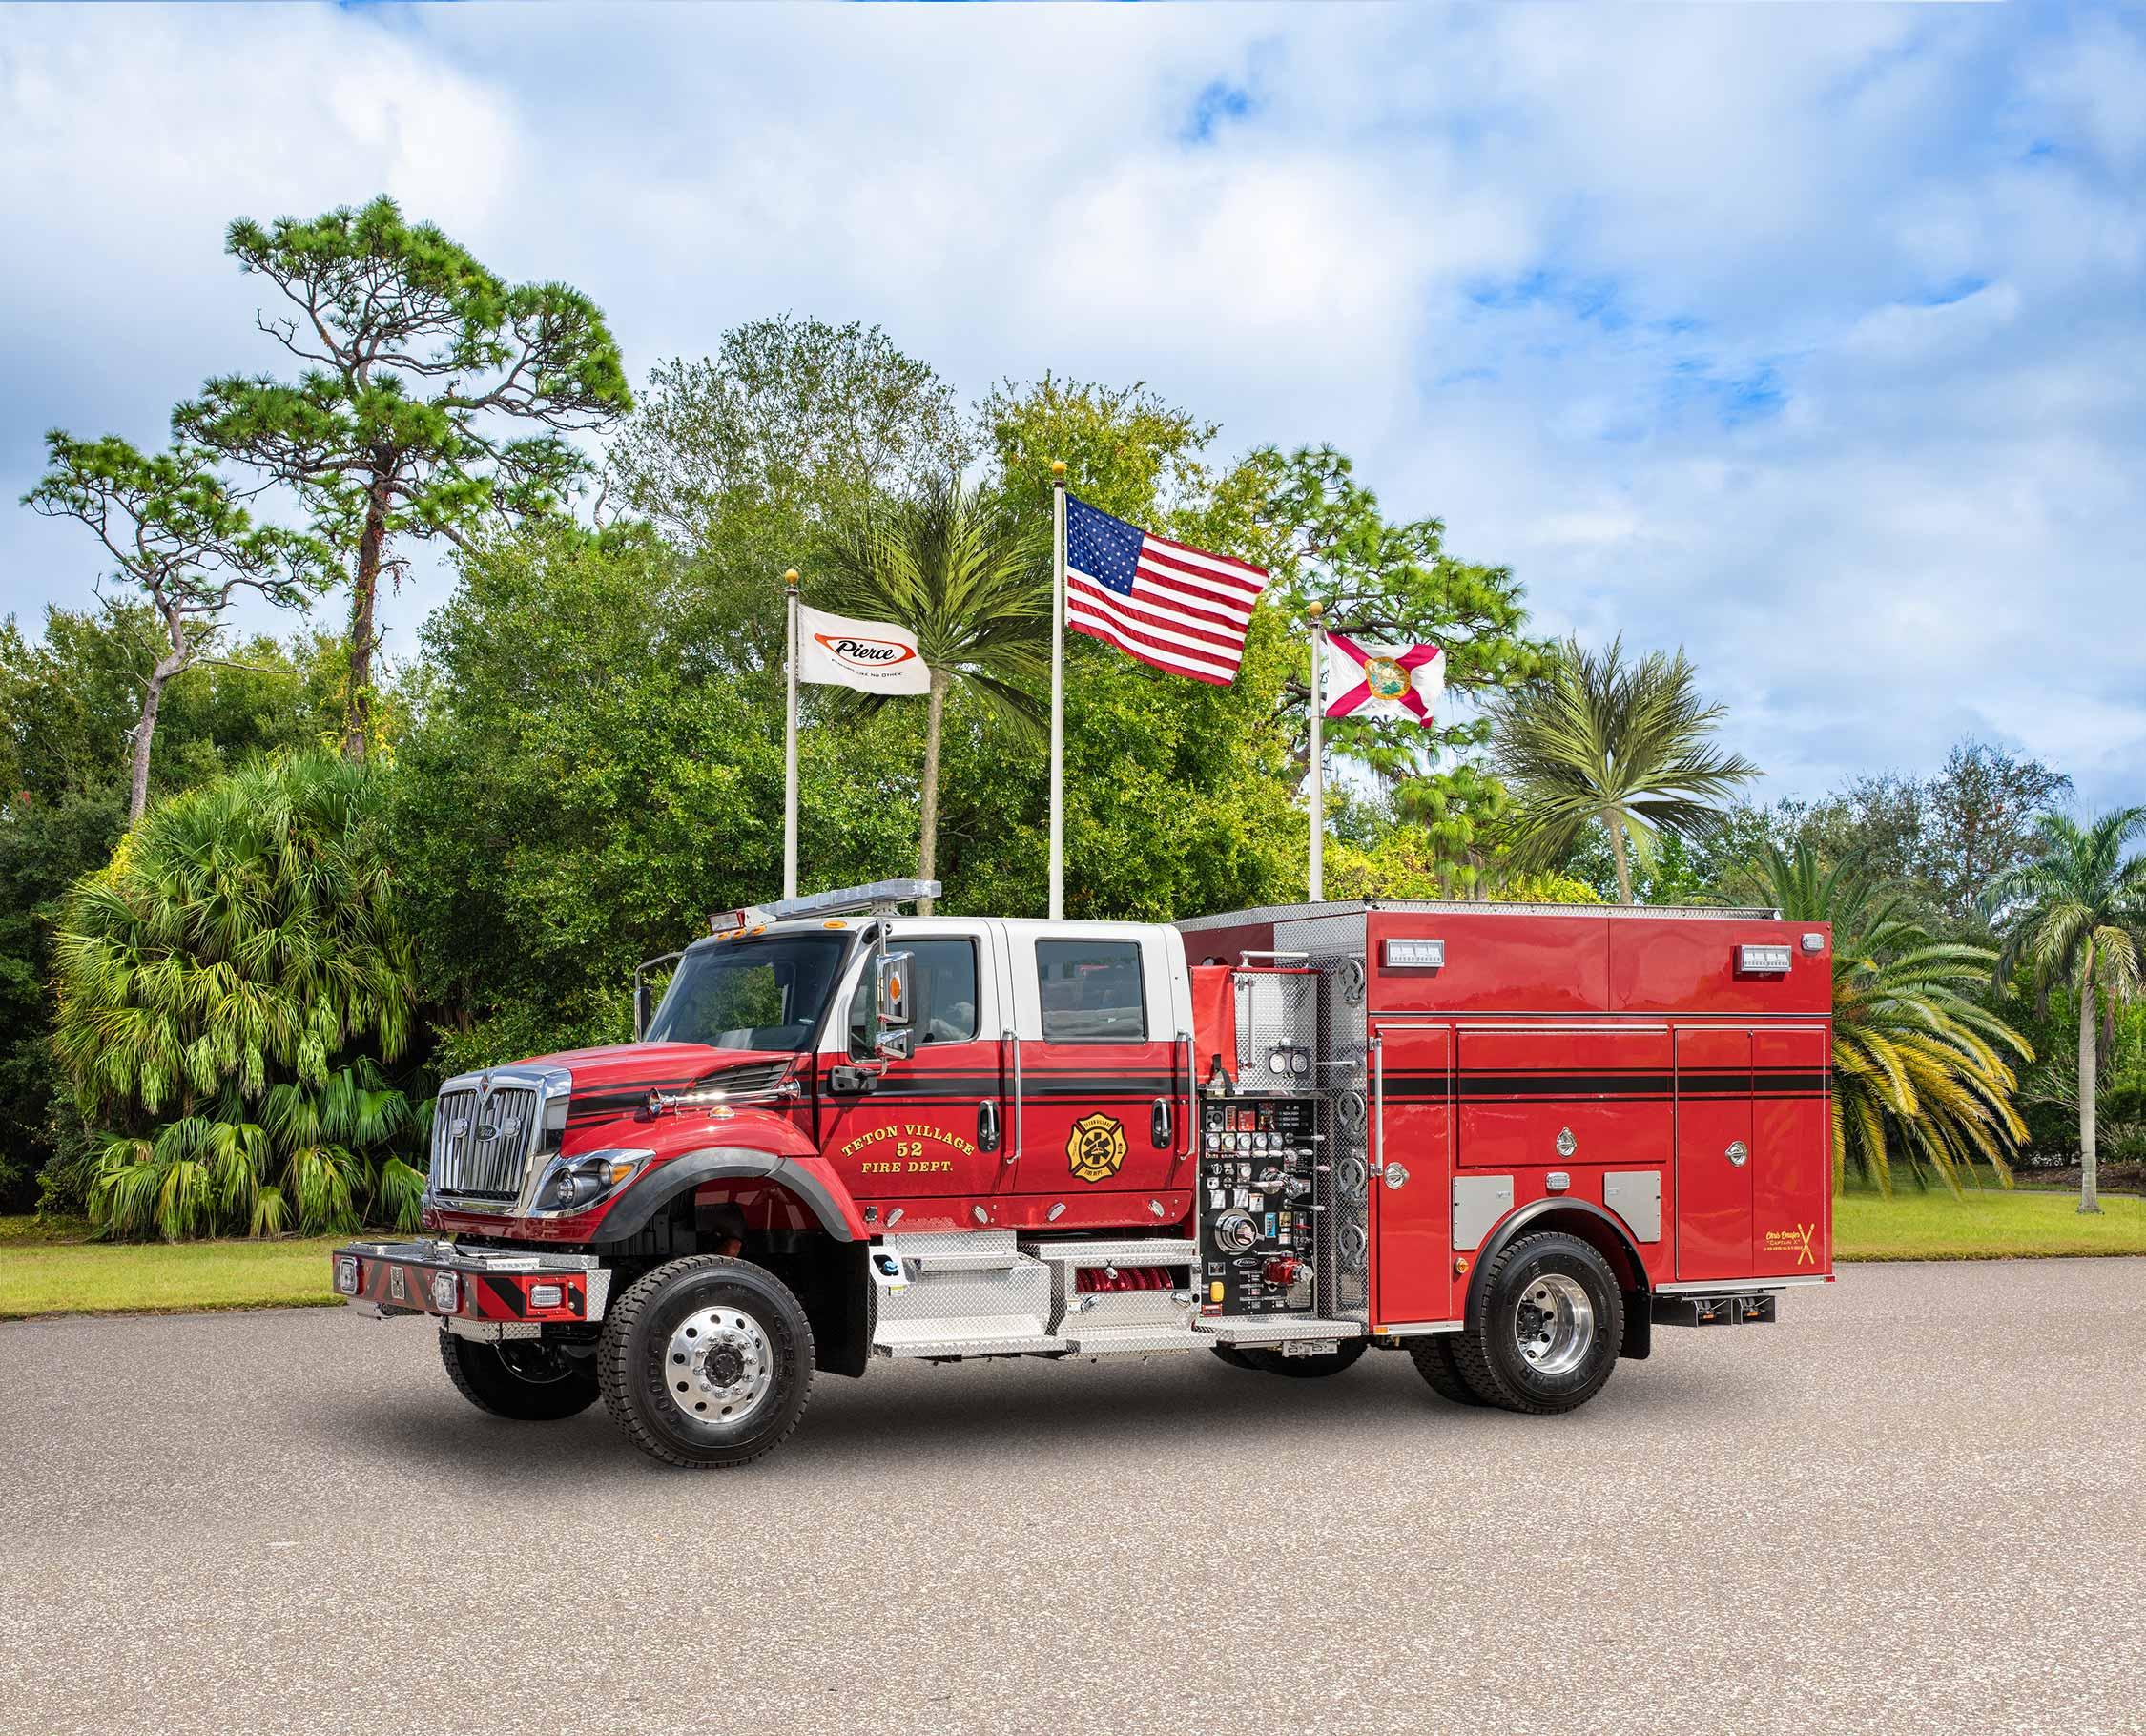 Teton Village Special Fire District - Pumper